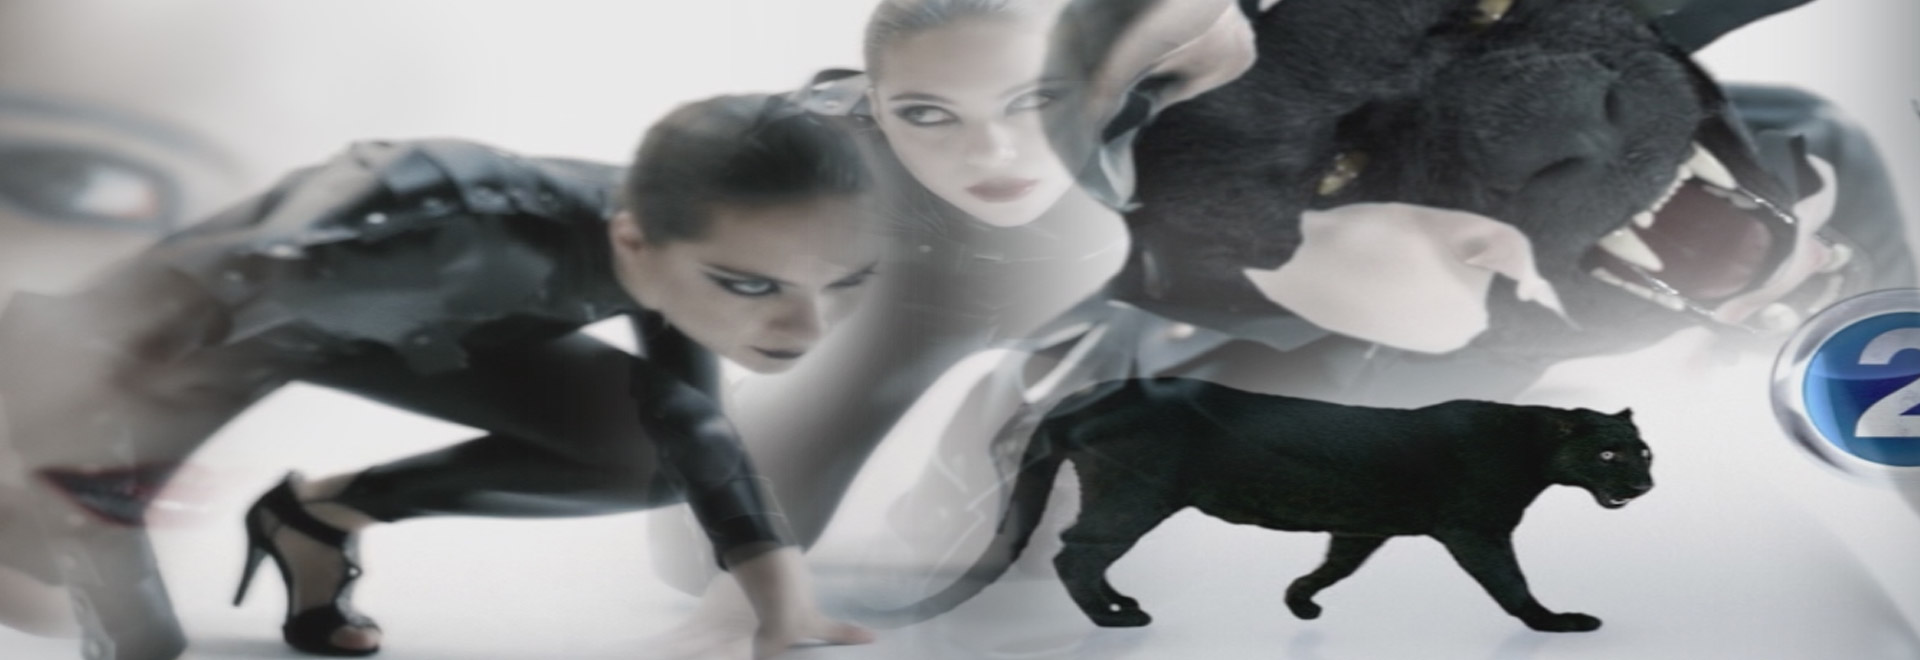 js-filmproduction-postproduction-commercial-mbc-panter-header